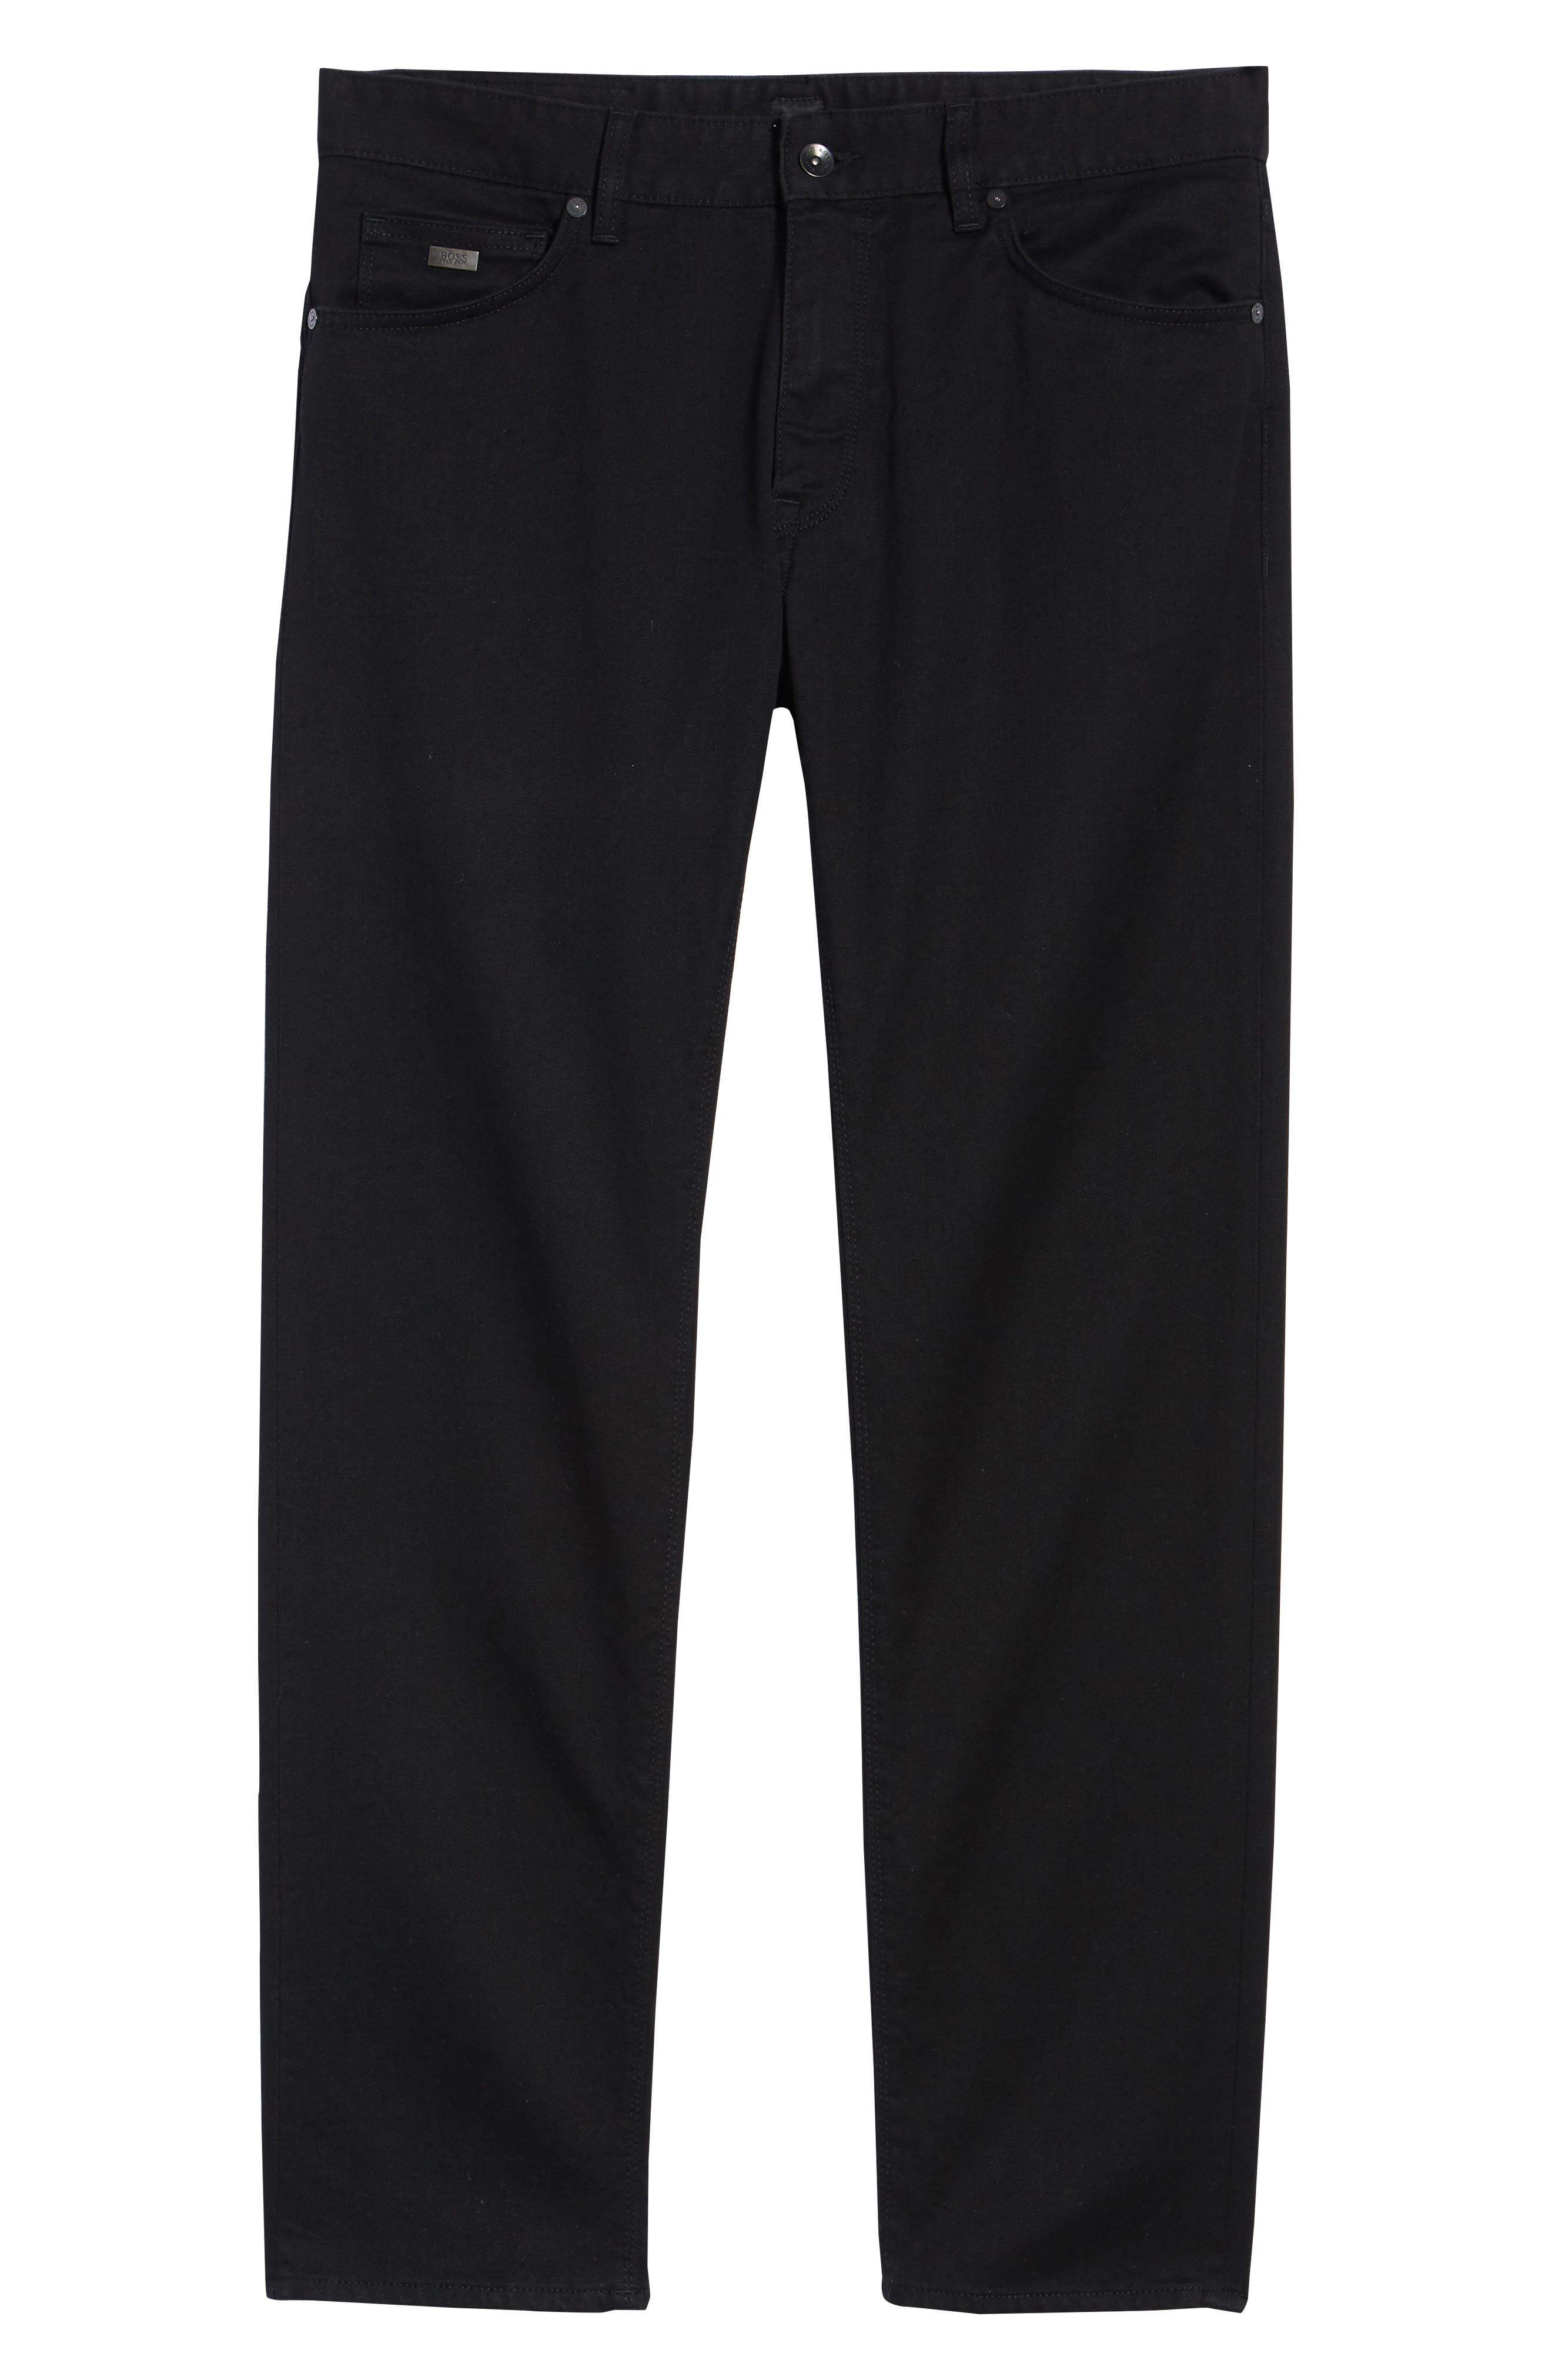 Maine Straight Leg Jeans,                             Alternate thumbnail 6, color,                             Black